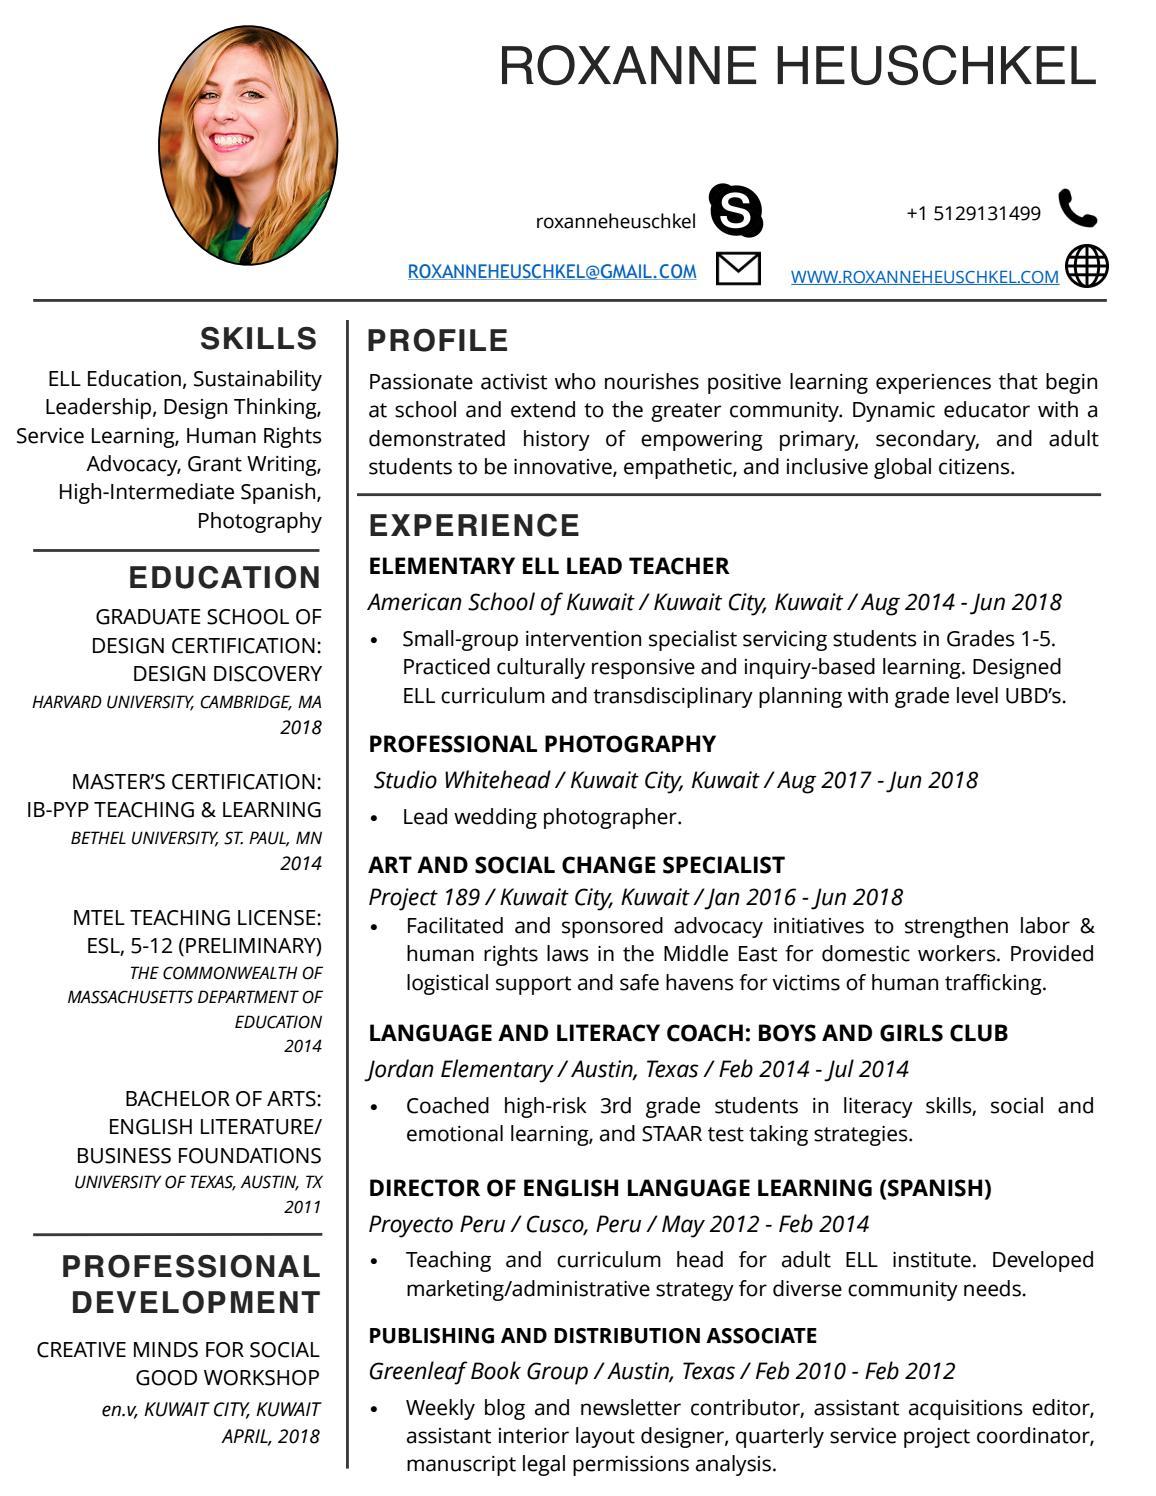 roxanne resume 2019 by roxanne heuschkel